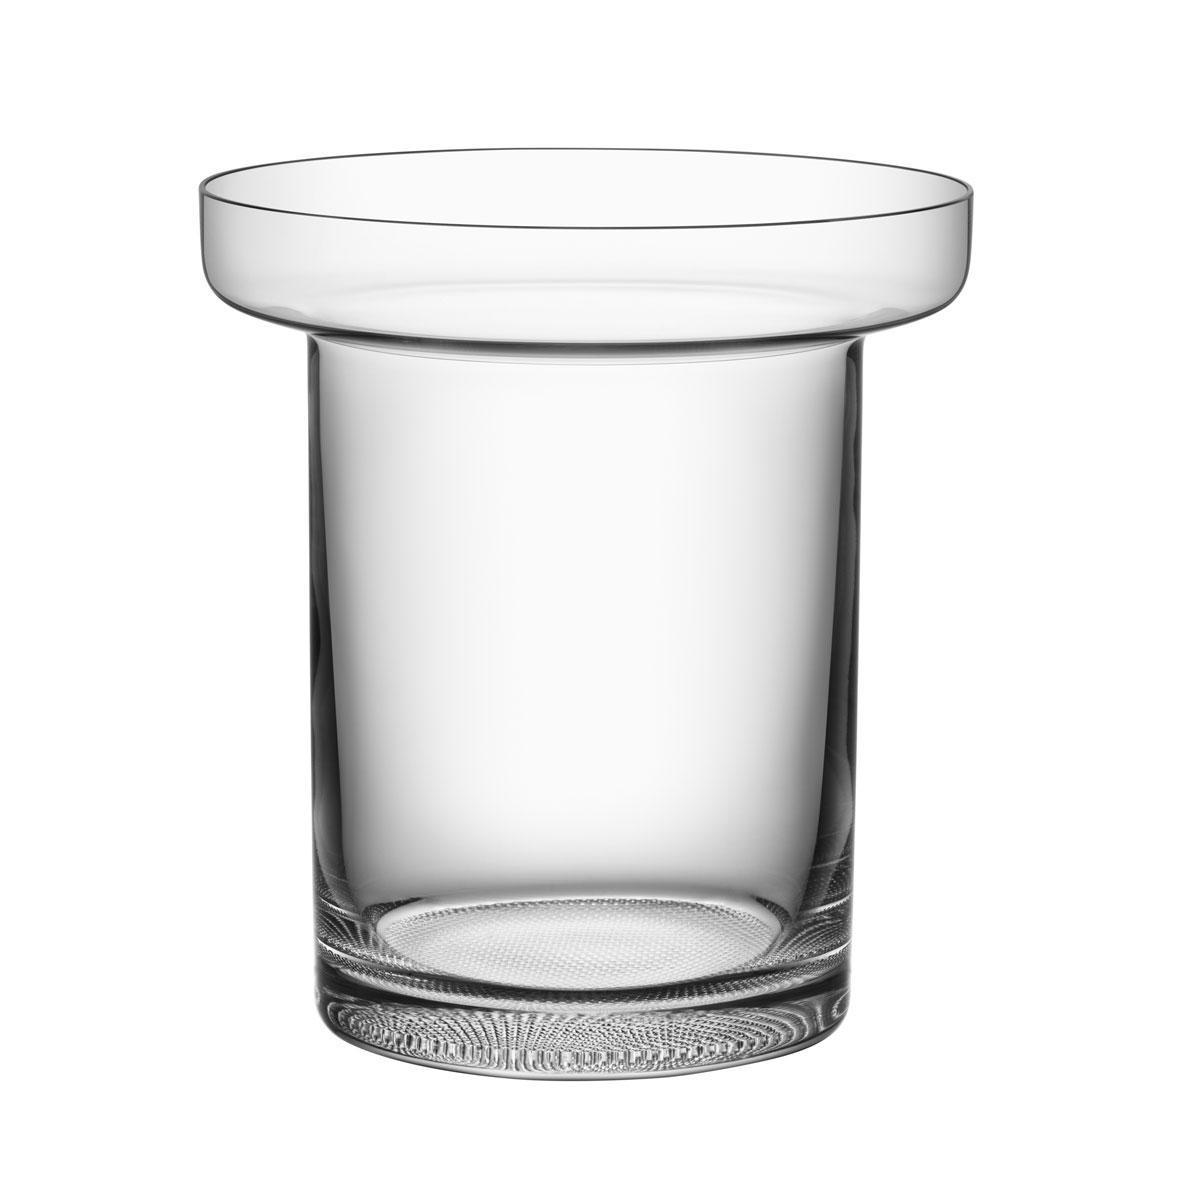 Kosta Boda Limelight Tulip Crystal Vase